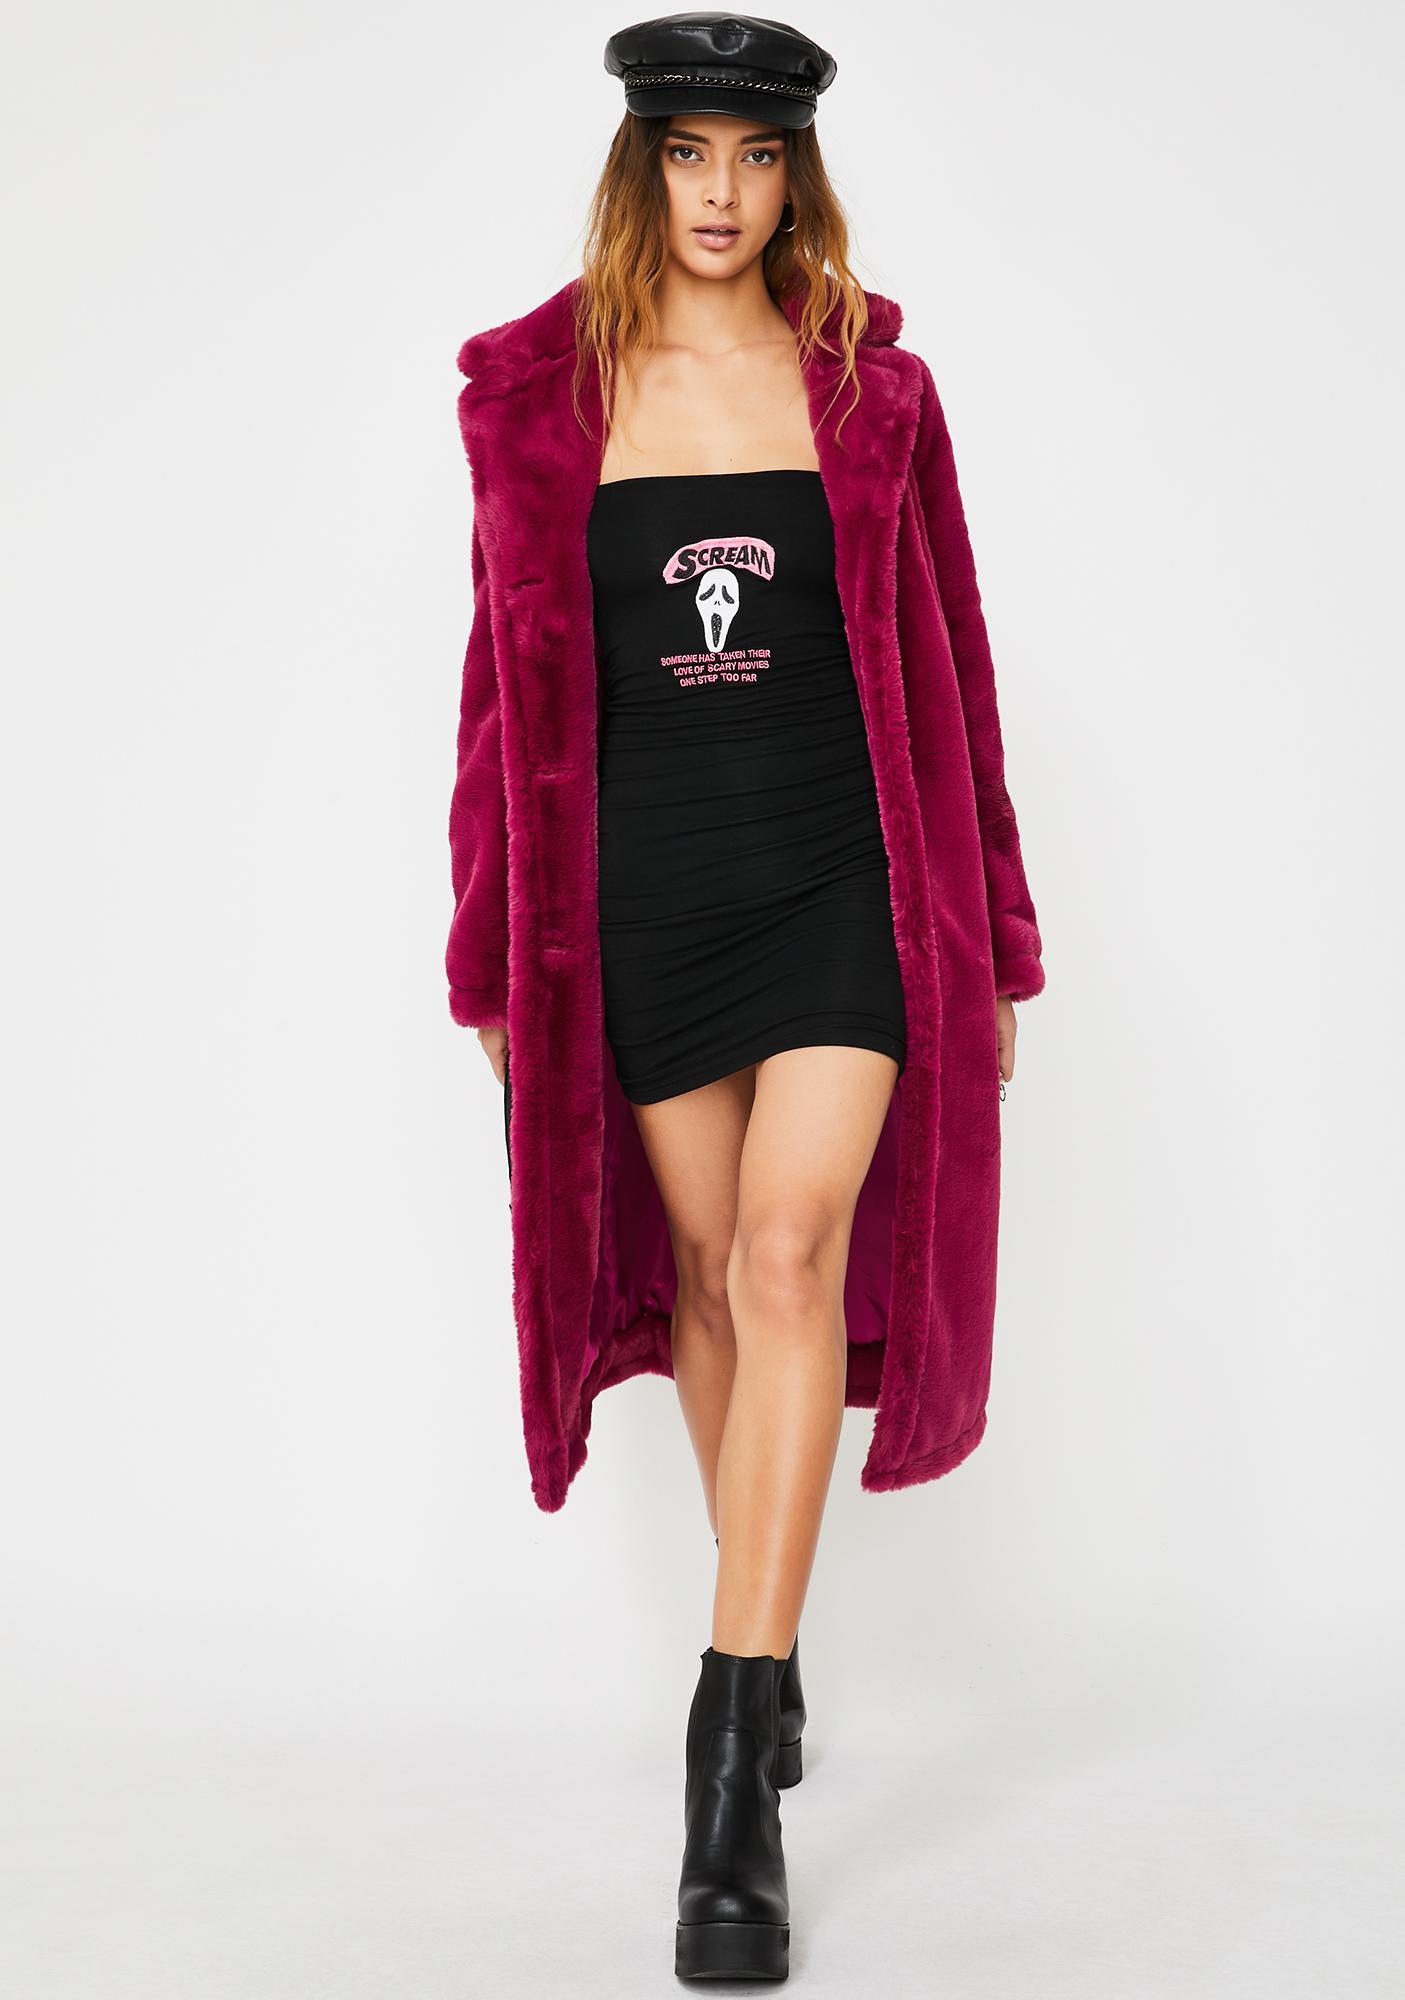 O Mighty Scream Long Sleeve Dress